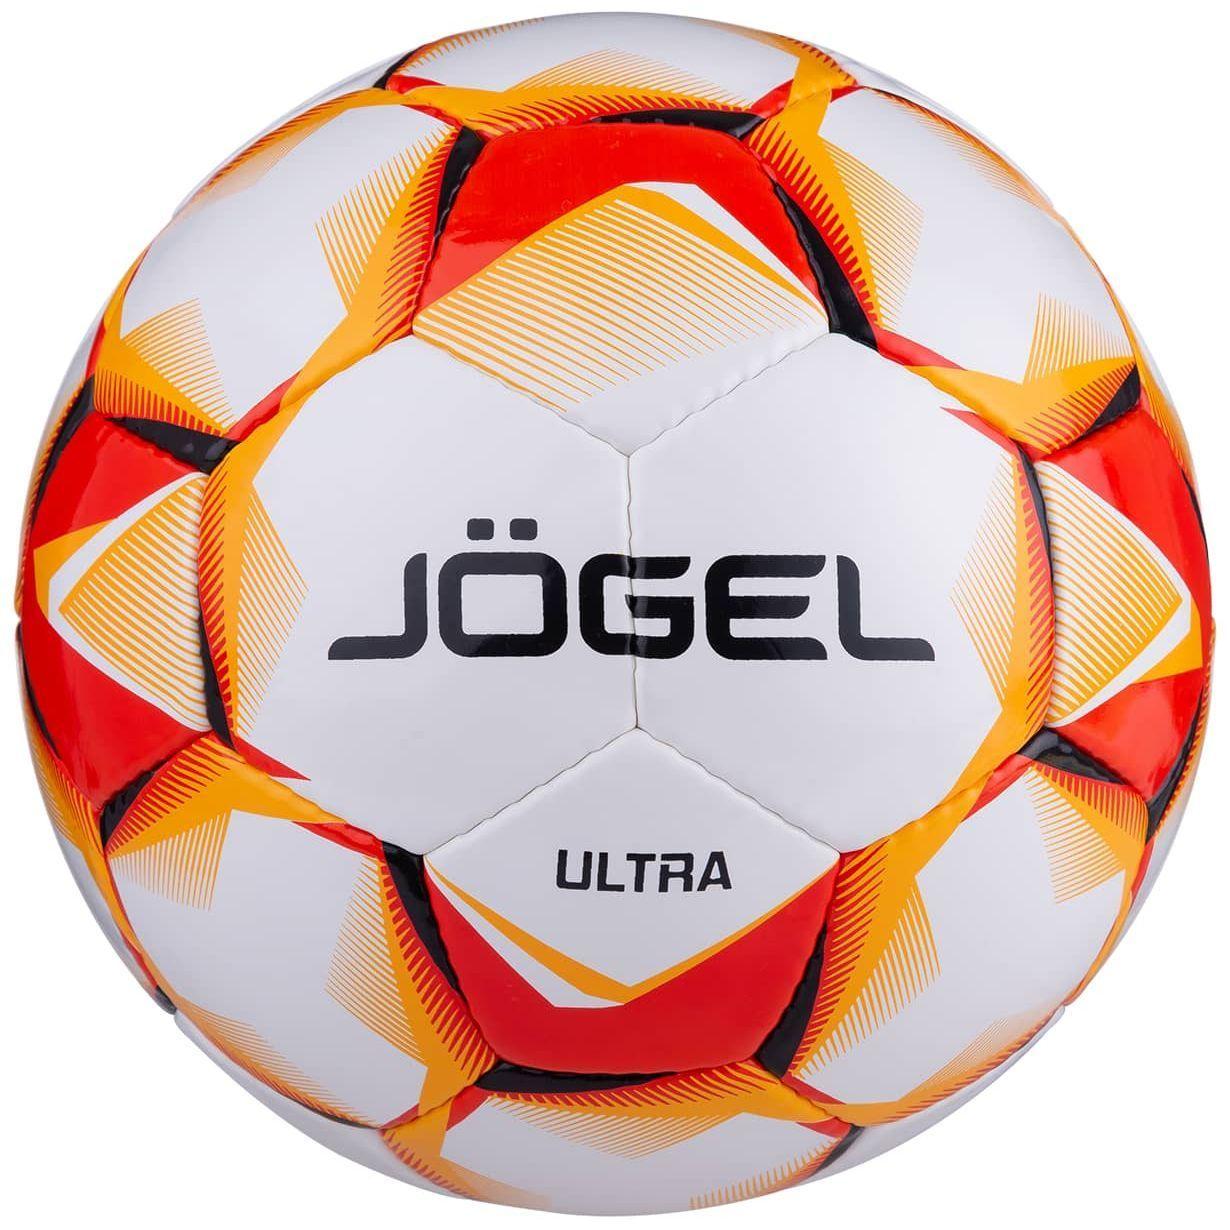 JOGEL ULTRA 17591